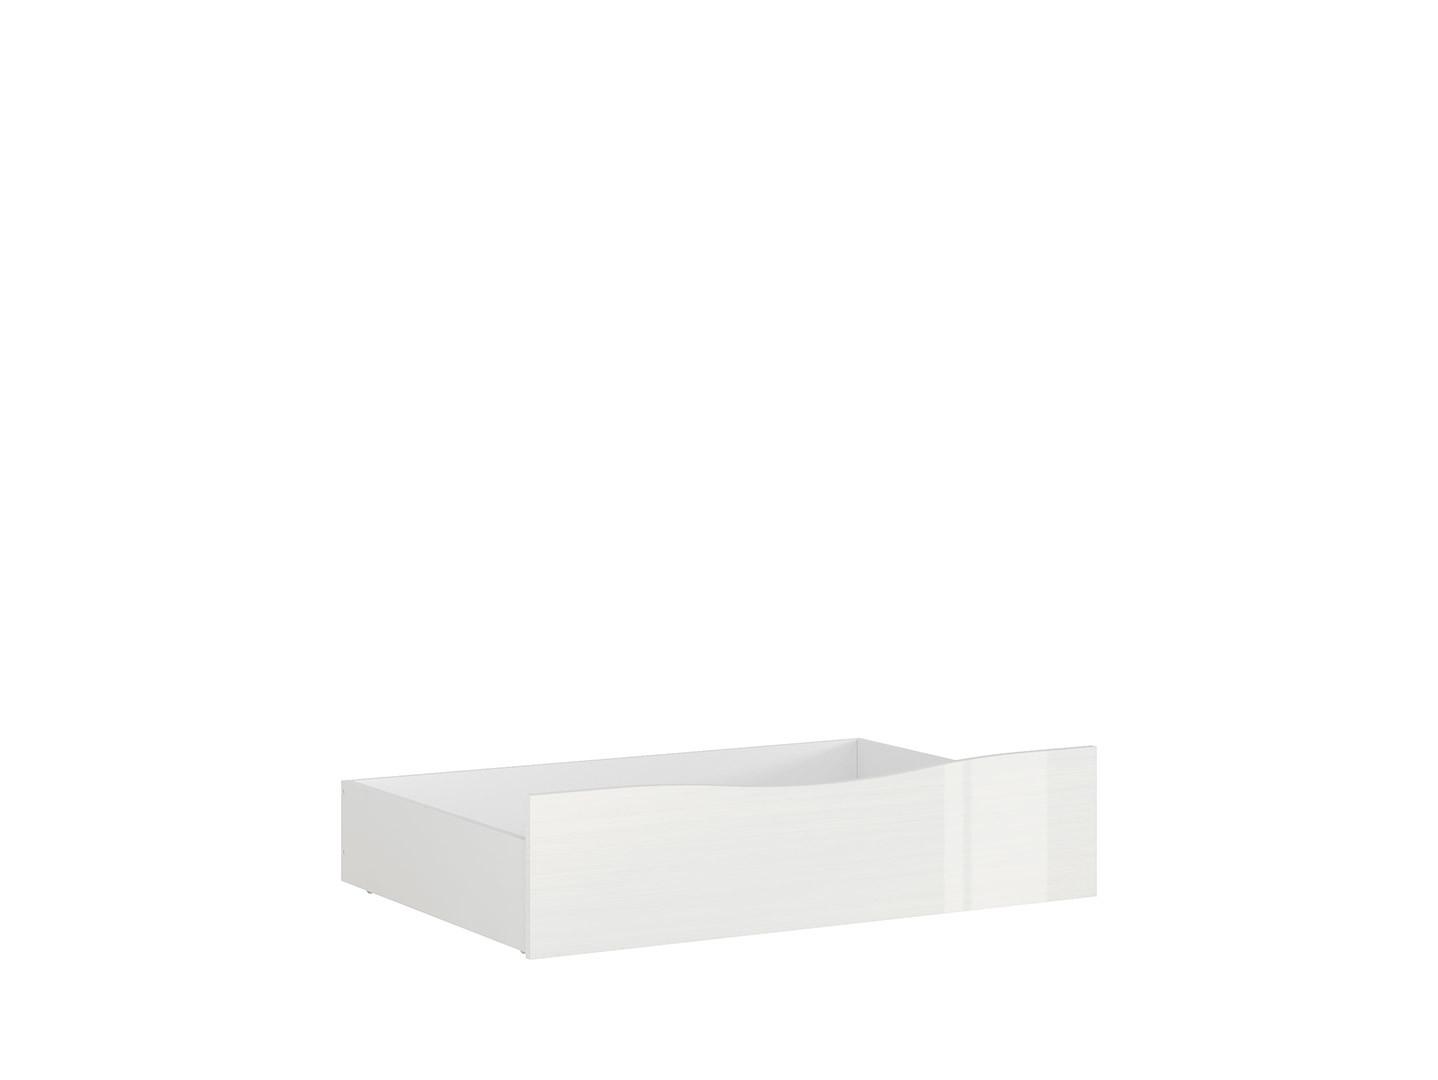 Úložný box pod postel W040